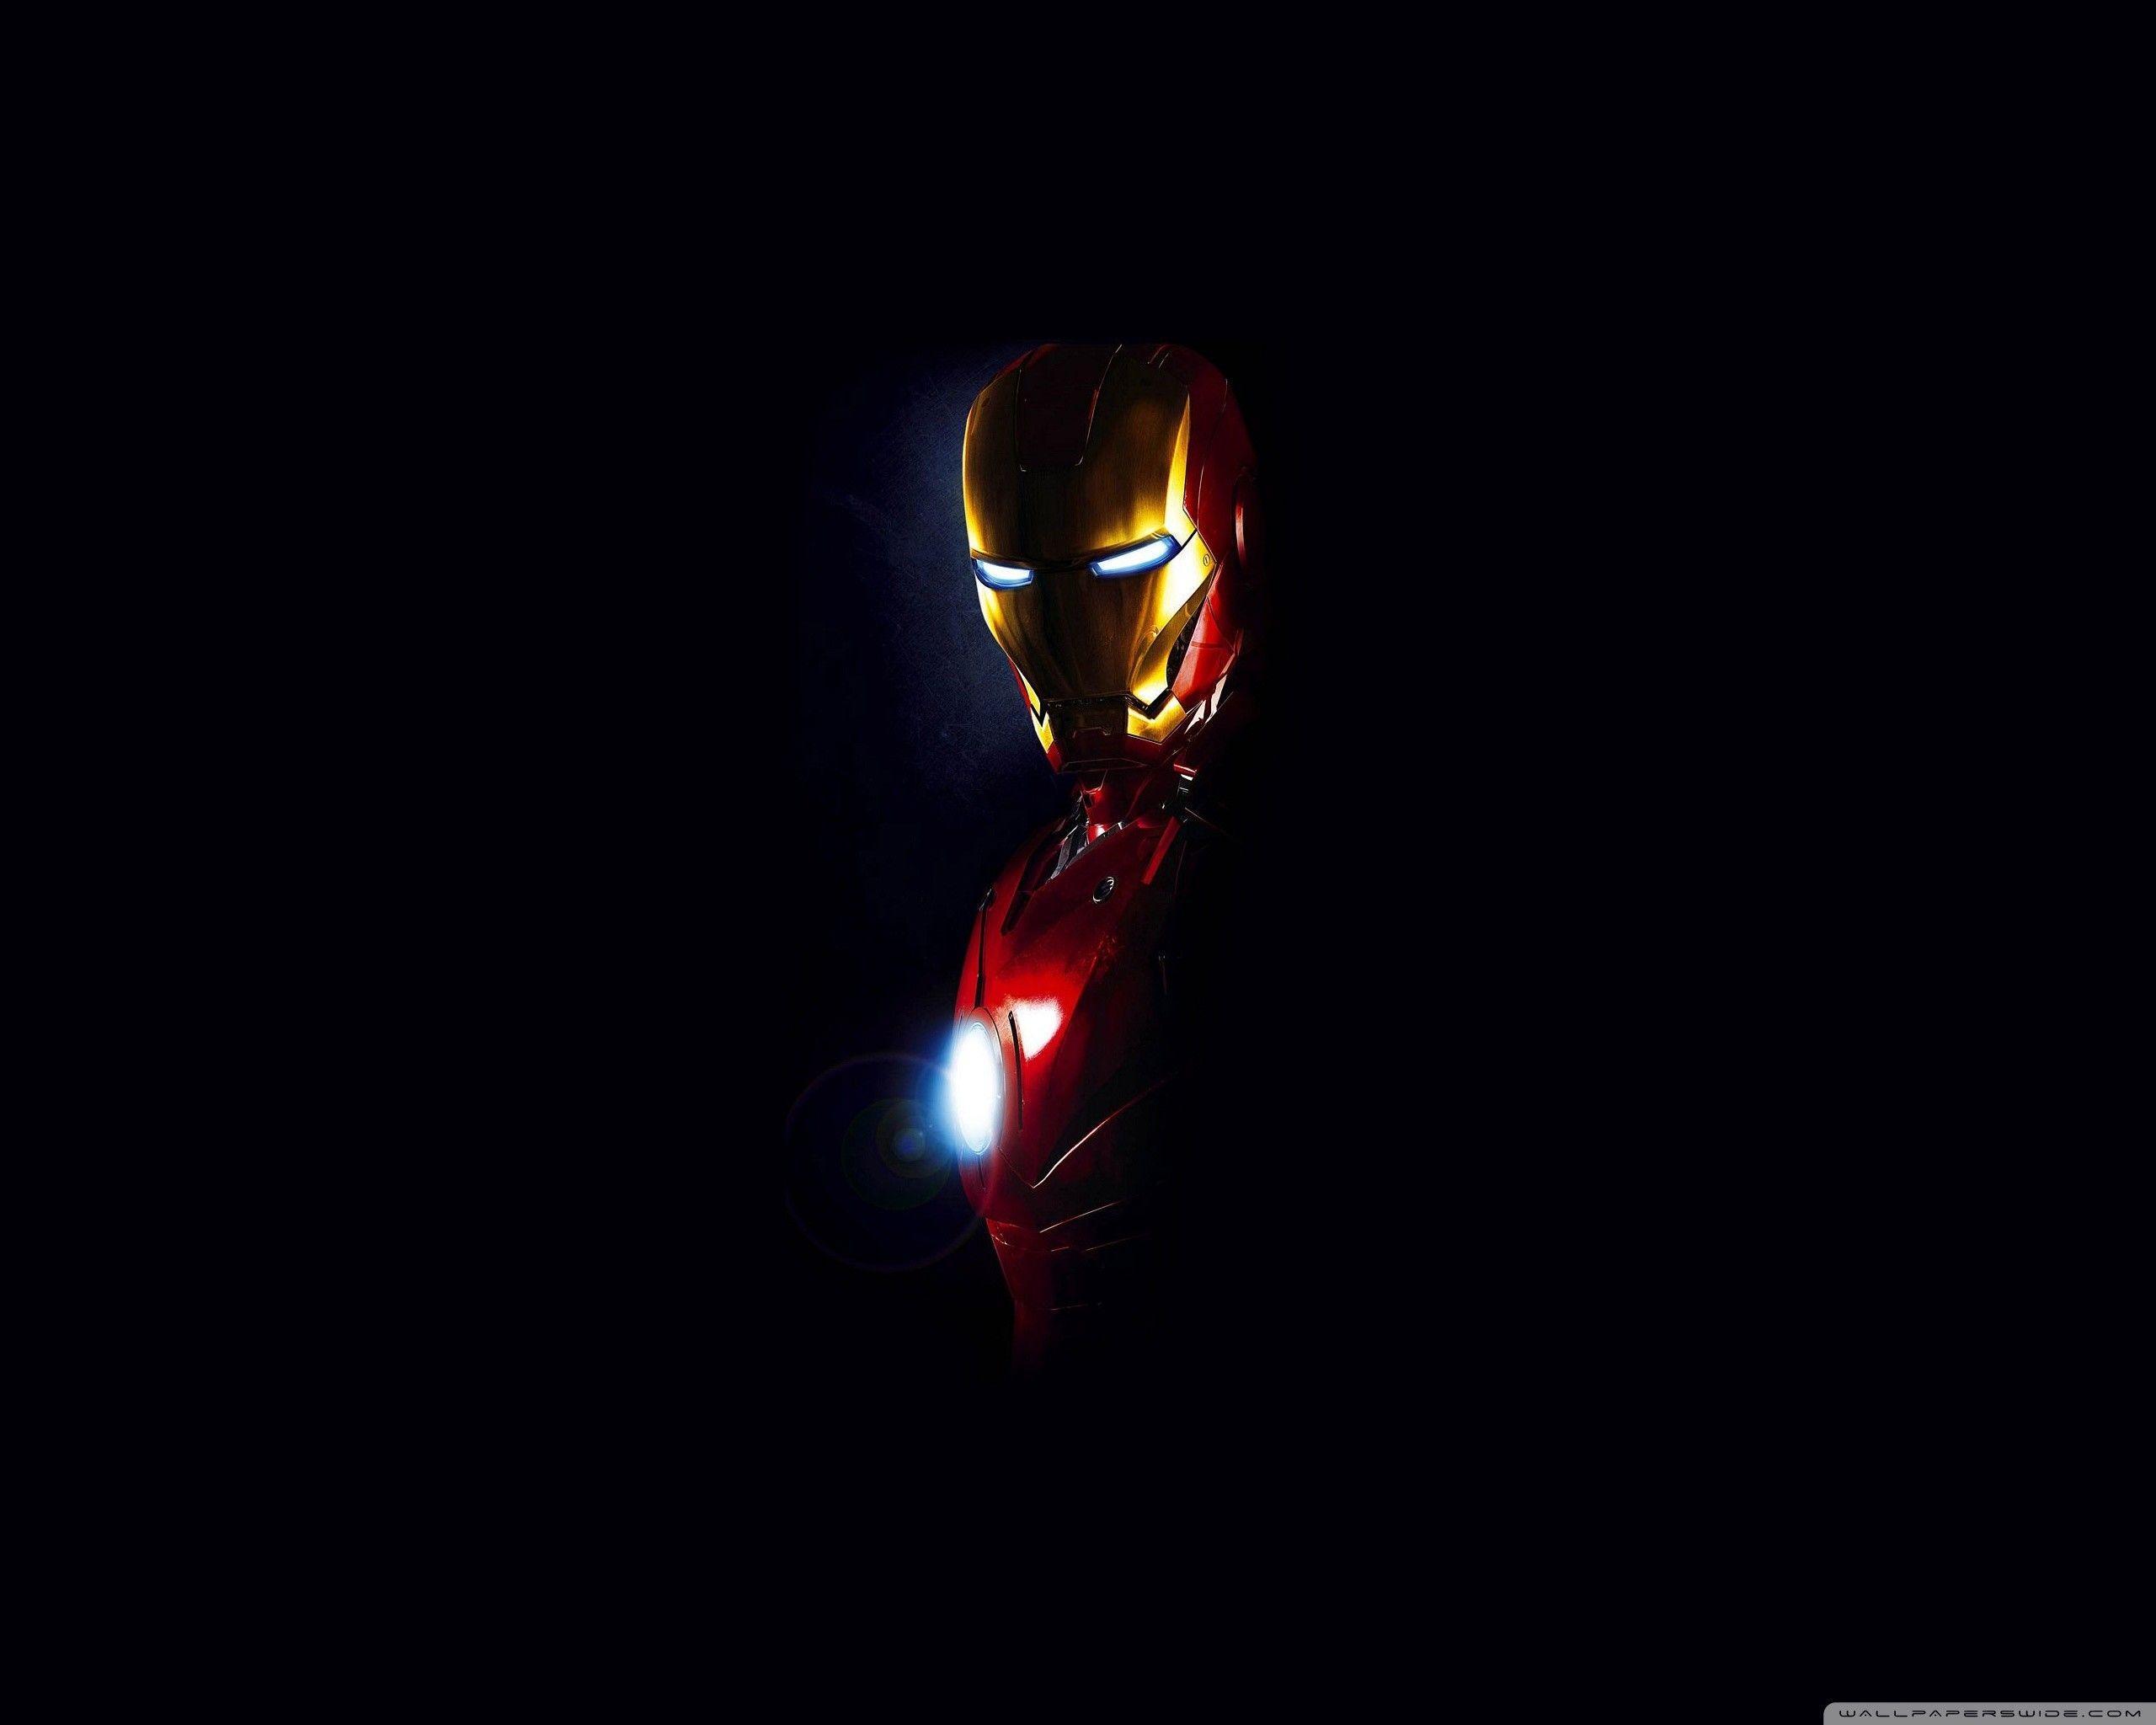 Iron Man Desktop Hd Wallpapers Top Free Iron Man Desktop Hd